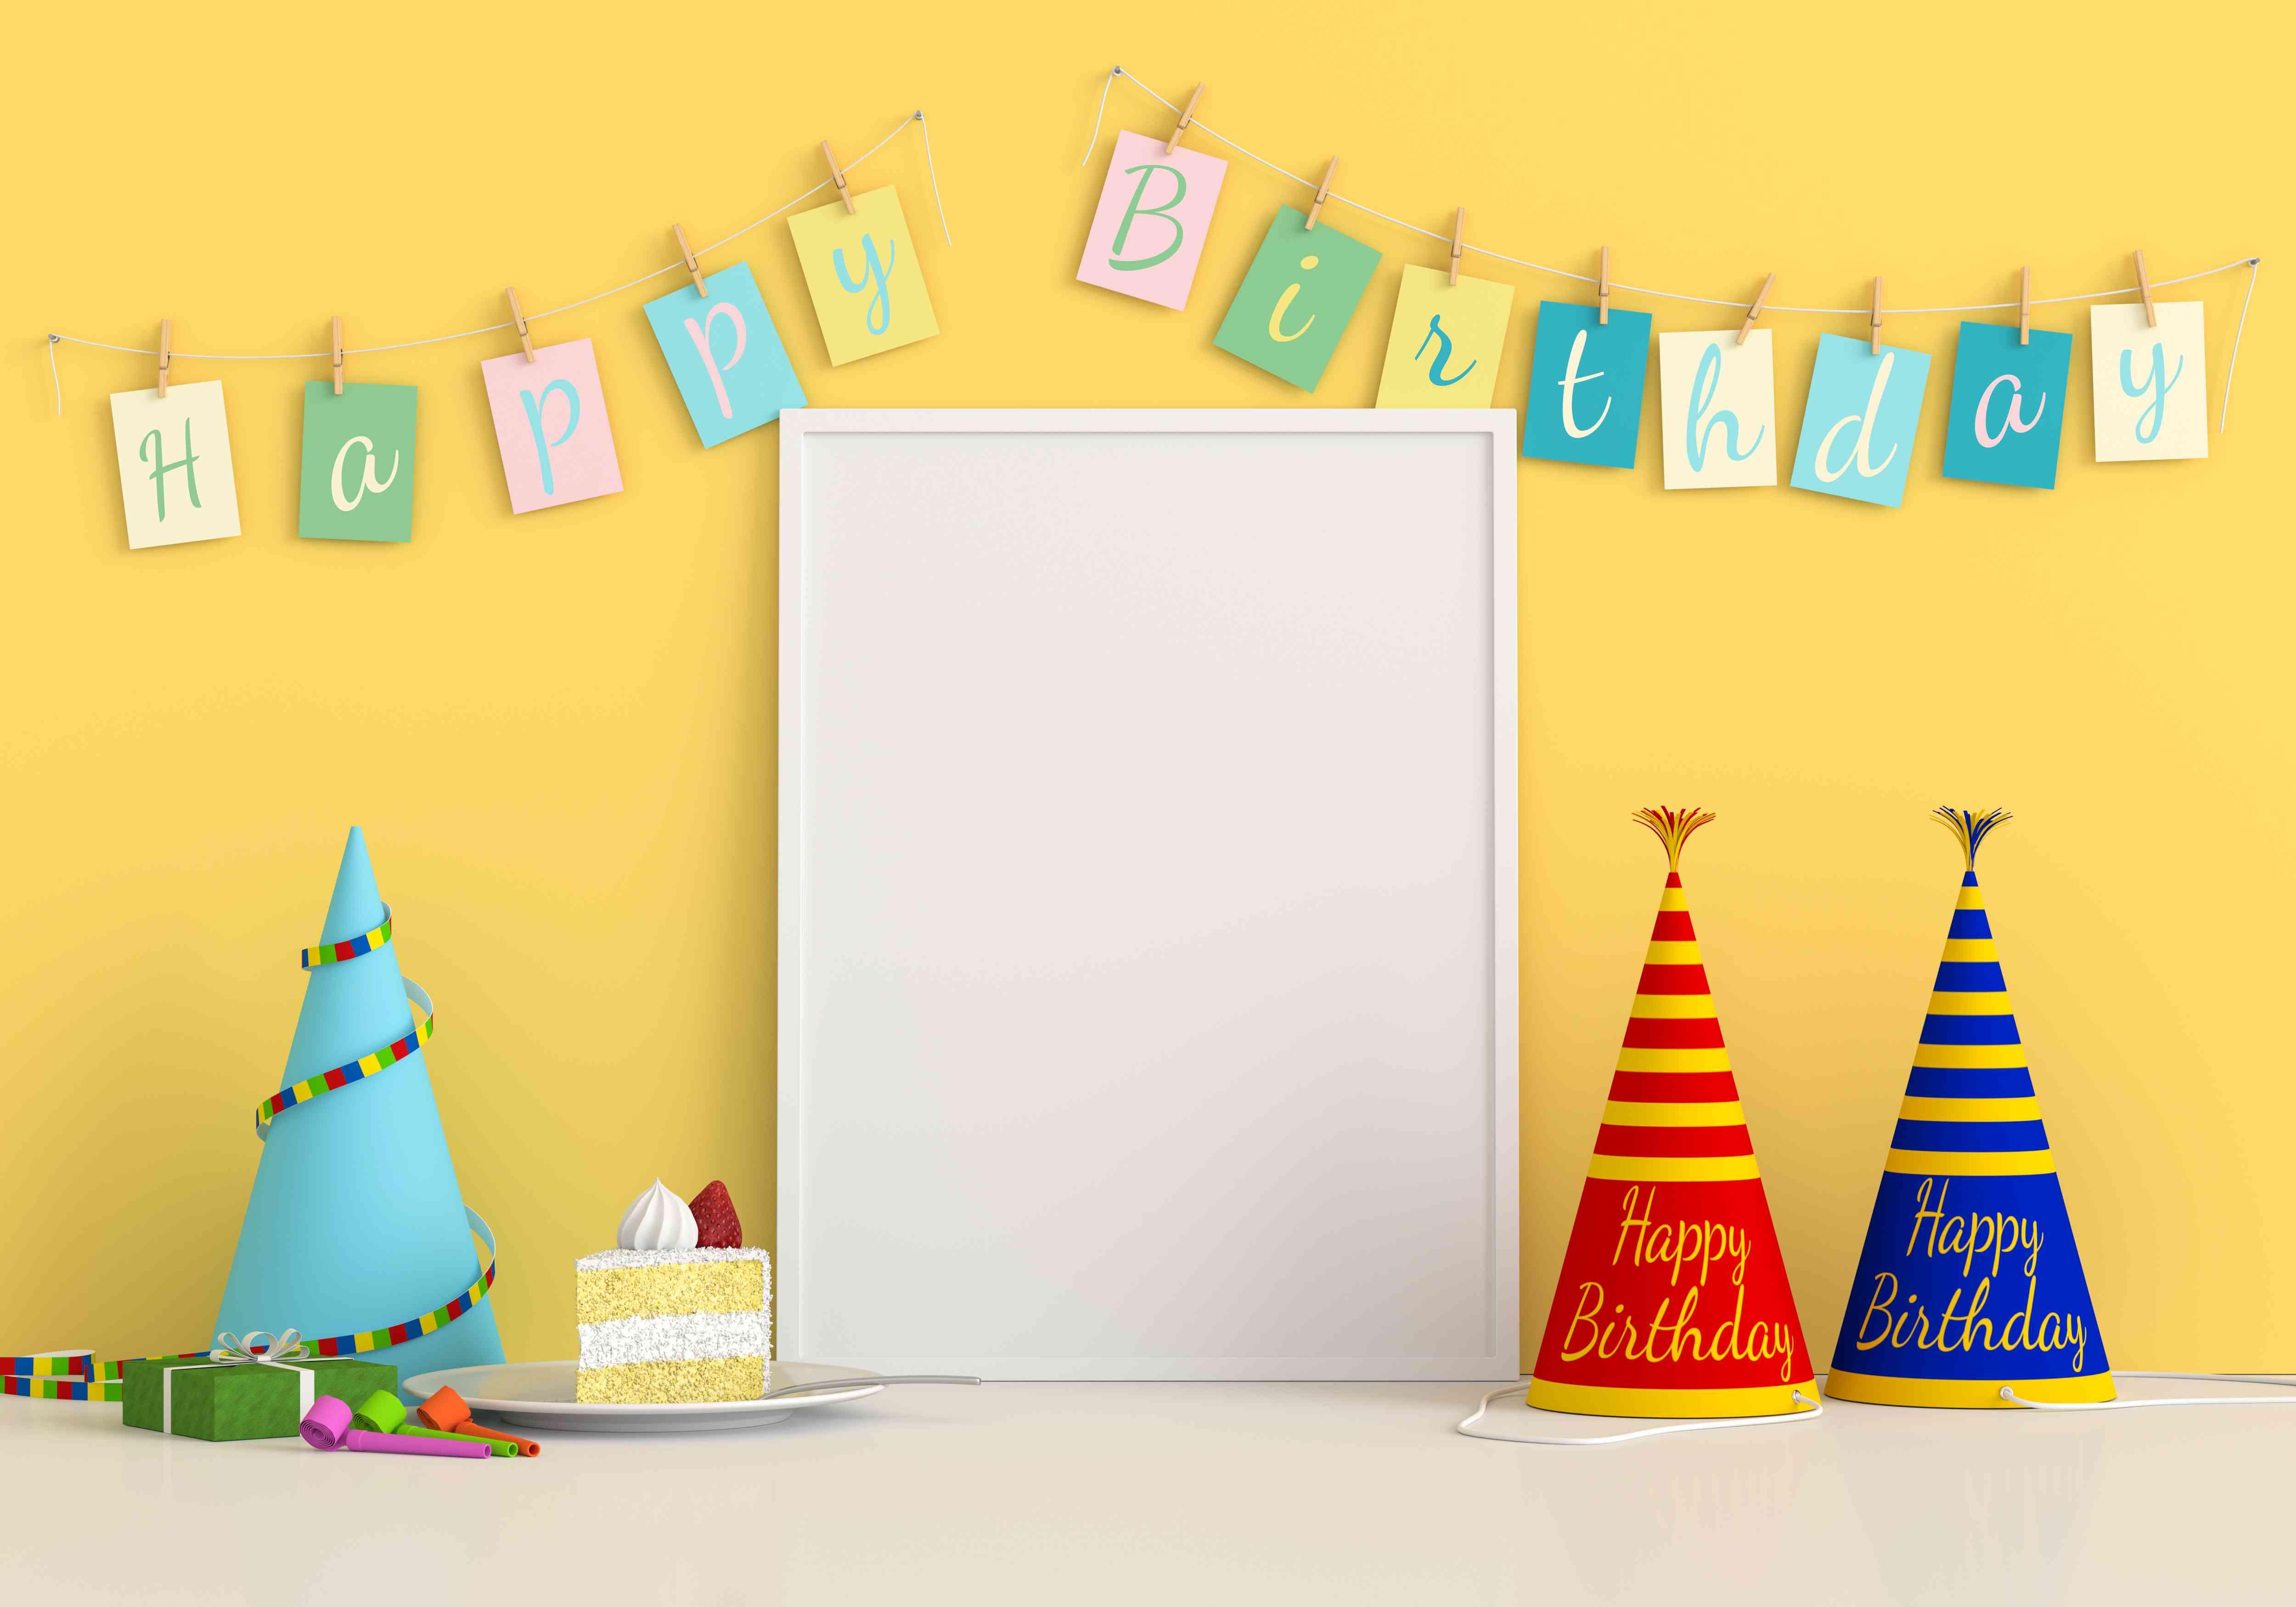 Blank photo frame for mockup on floor, Happy birthday concept